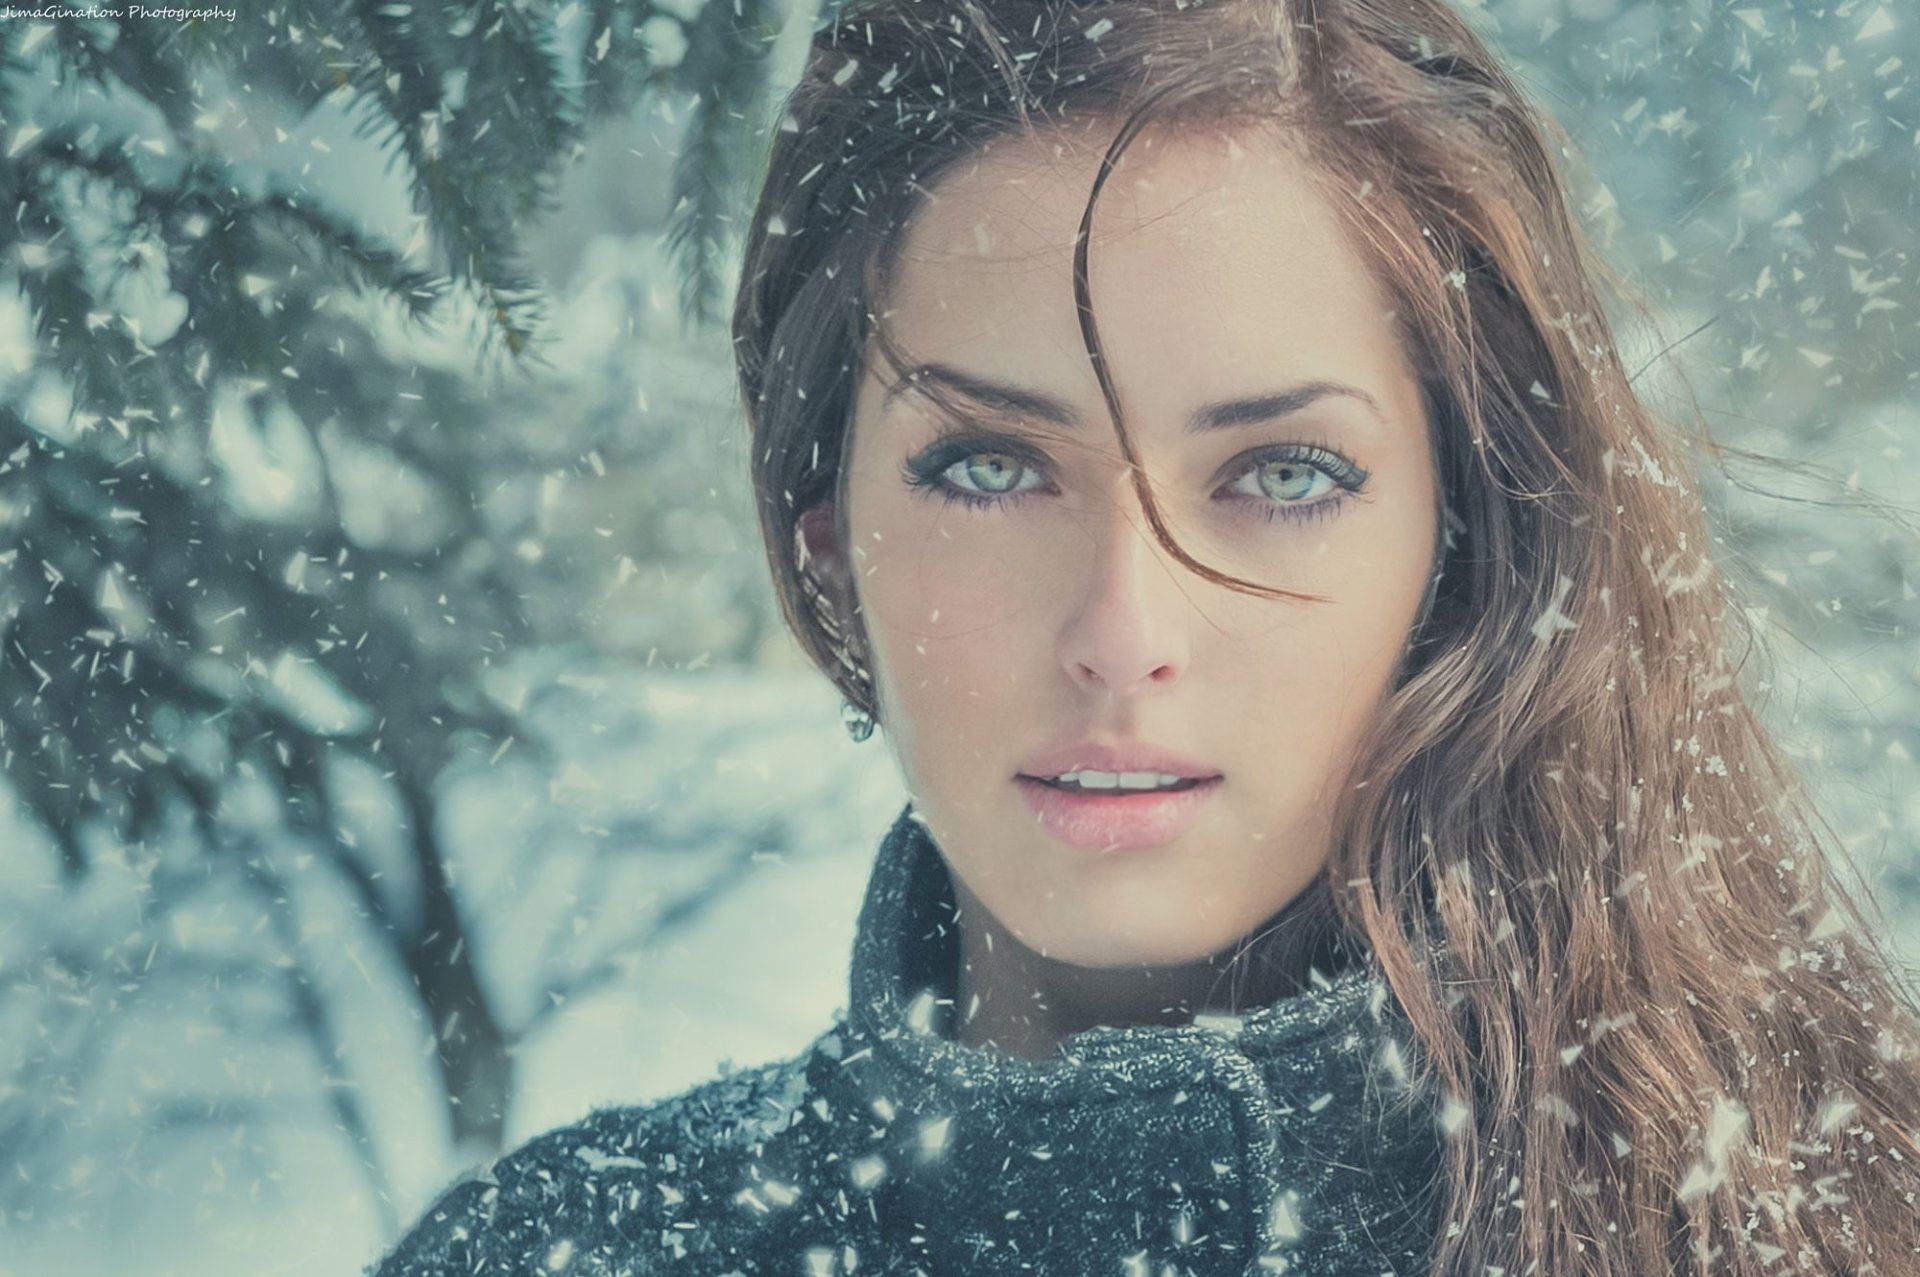 Women - Model  Green Eyes Girl Woman Brunette Snow Snowfall Wallpaper